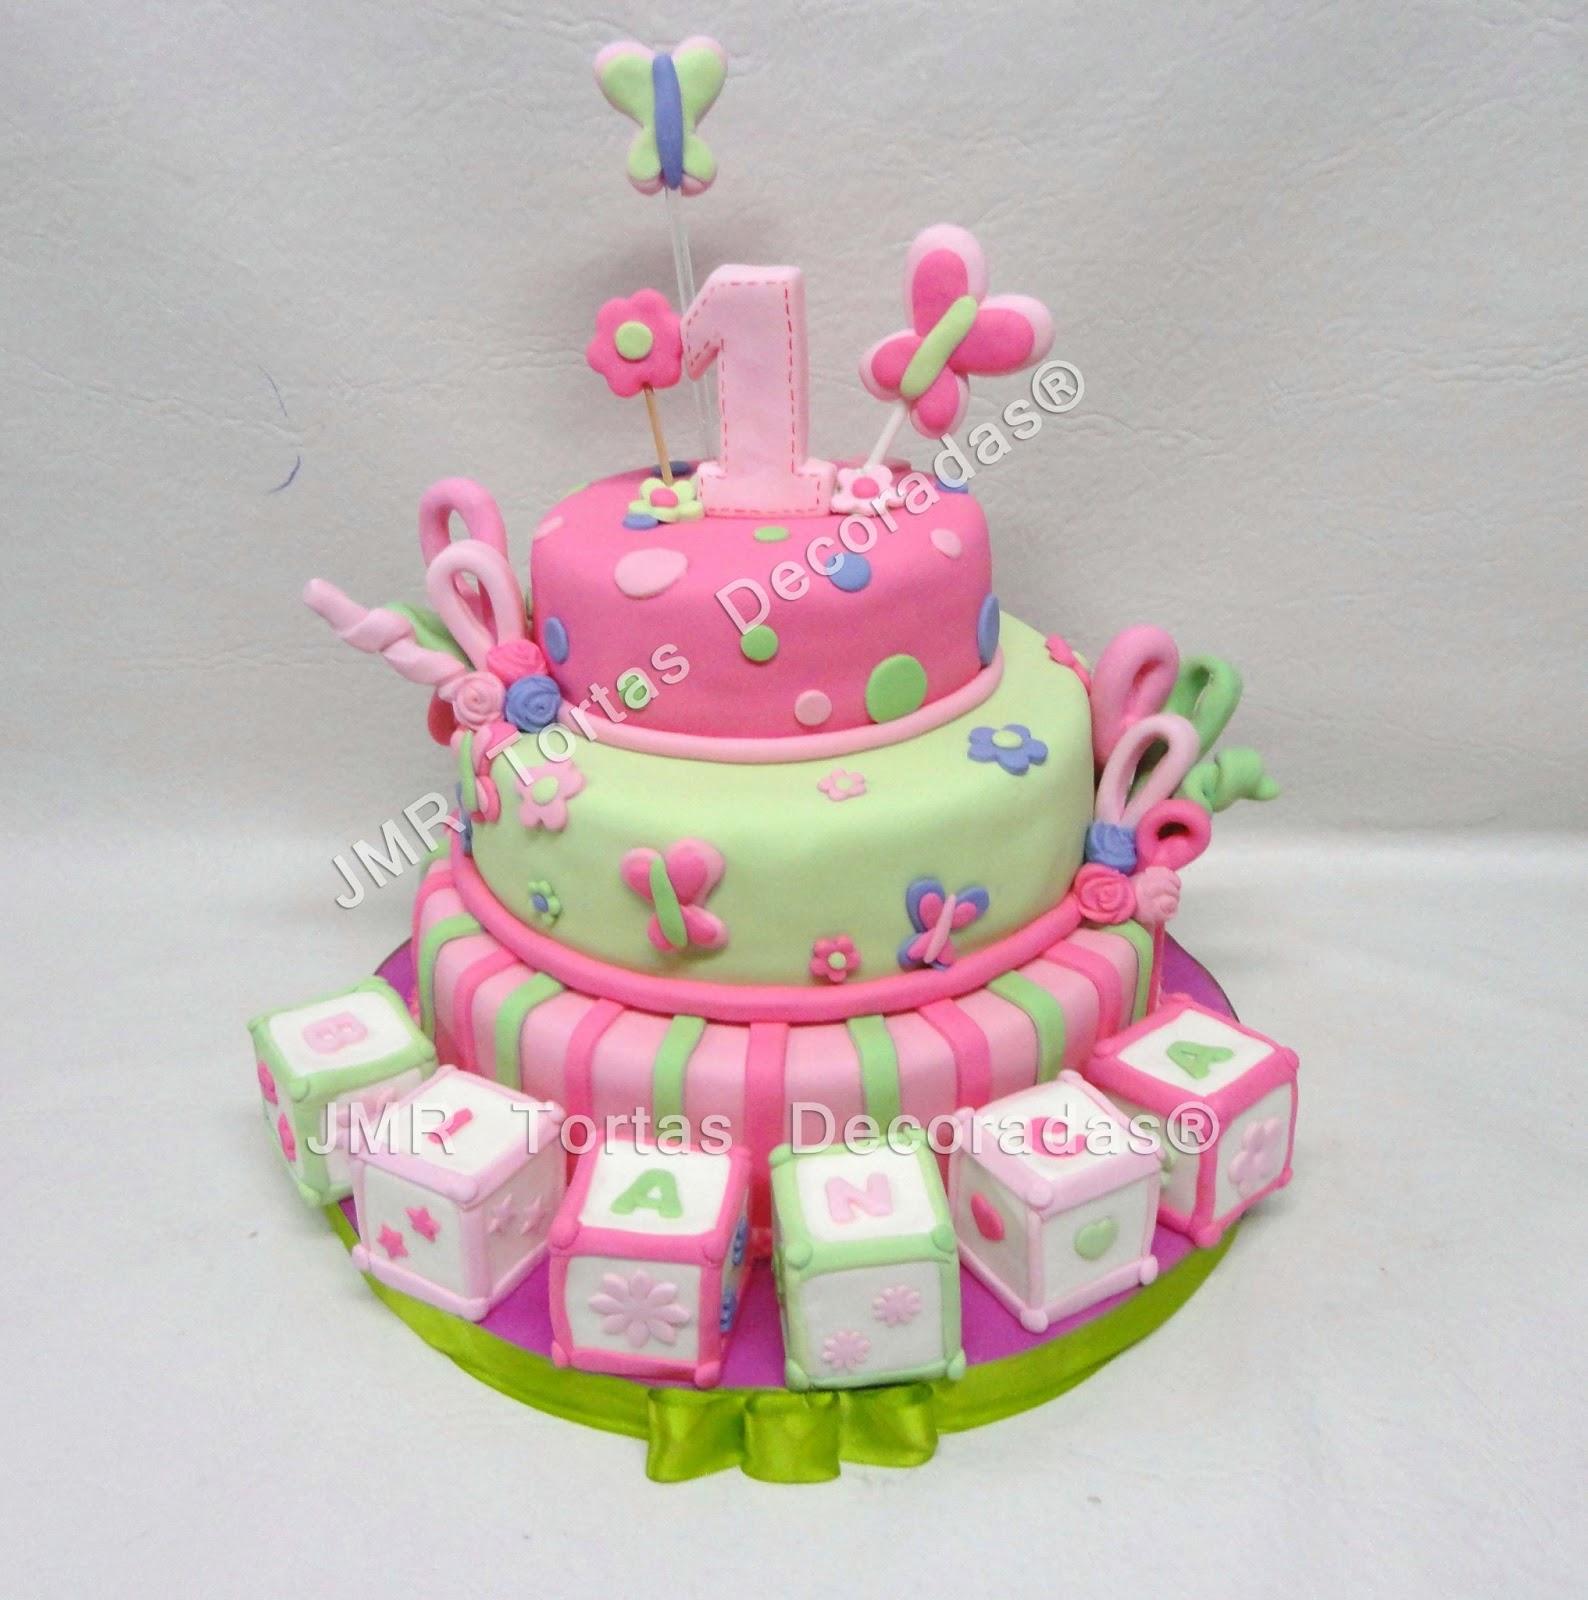 Pin pin tortas decoradas primer fiesta infantil pinterest for Tortas decoradas infantiles